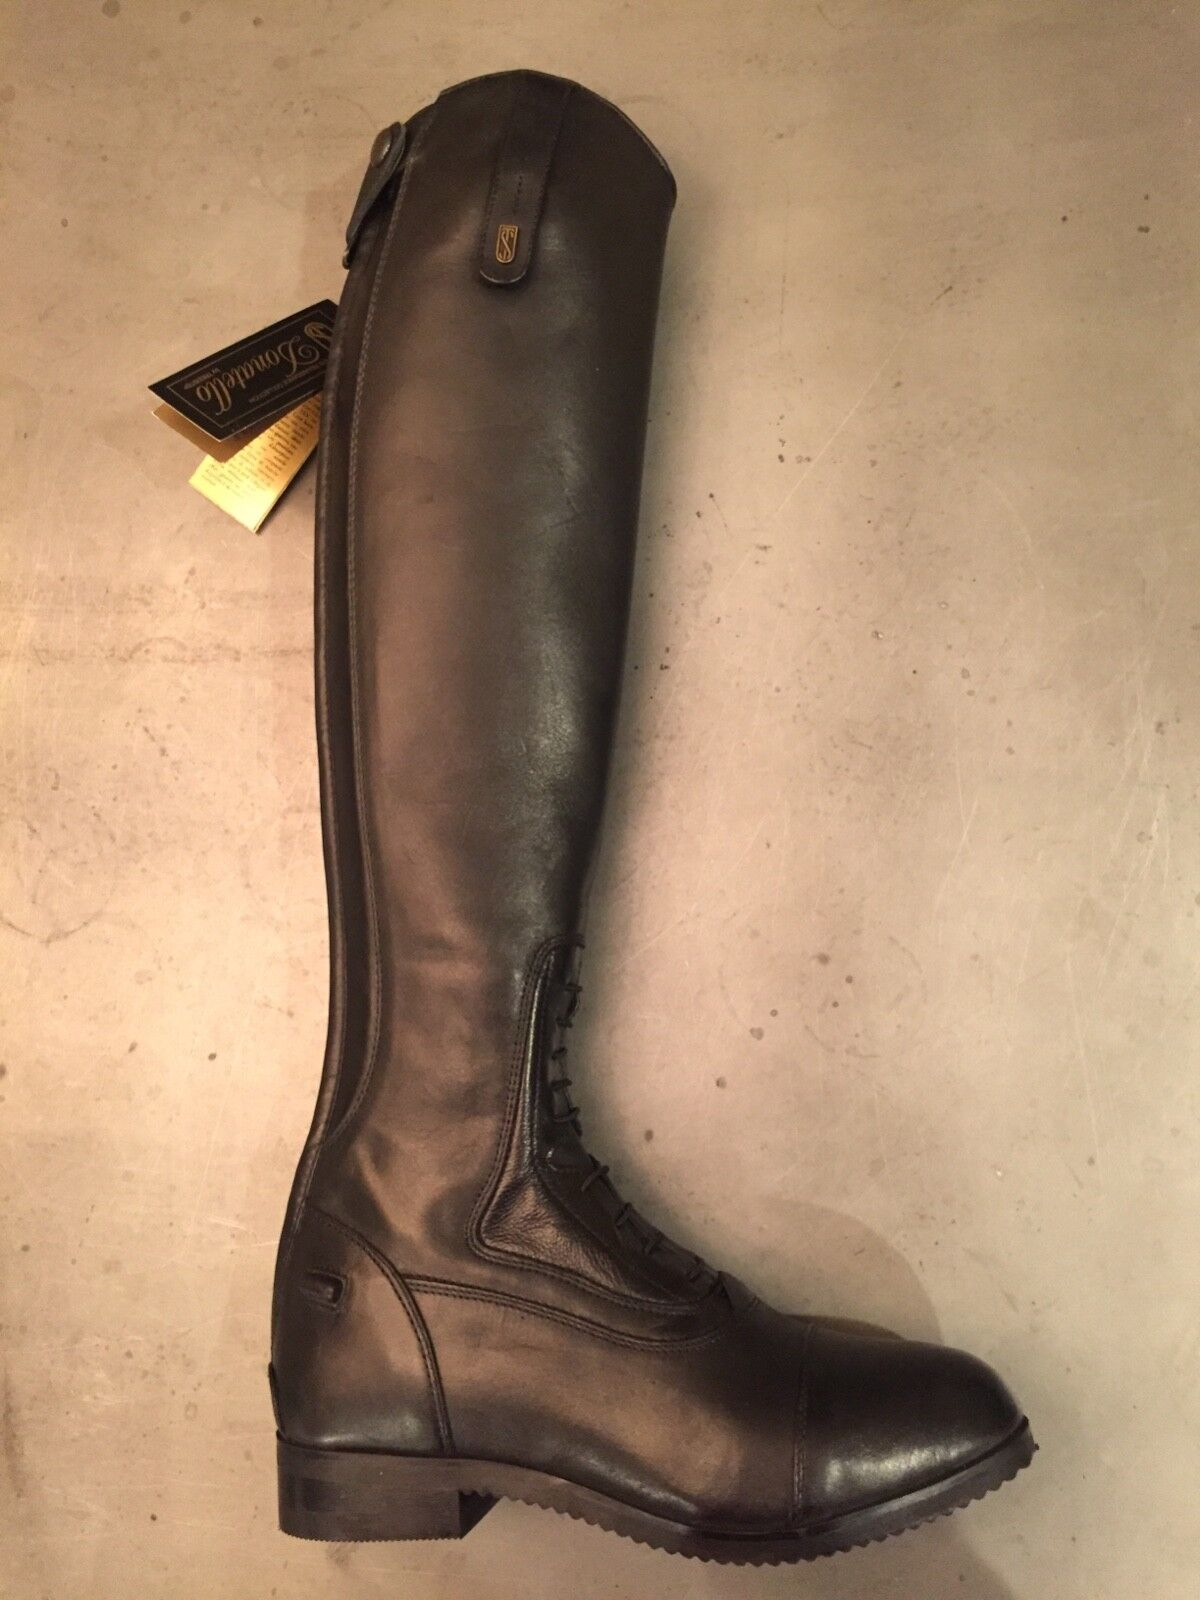 "NEW Blk Tredstep Donatello Field Boots sz 7 1 2, Reg calf 14"", Tall height 19"""